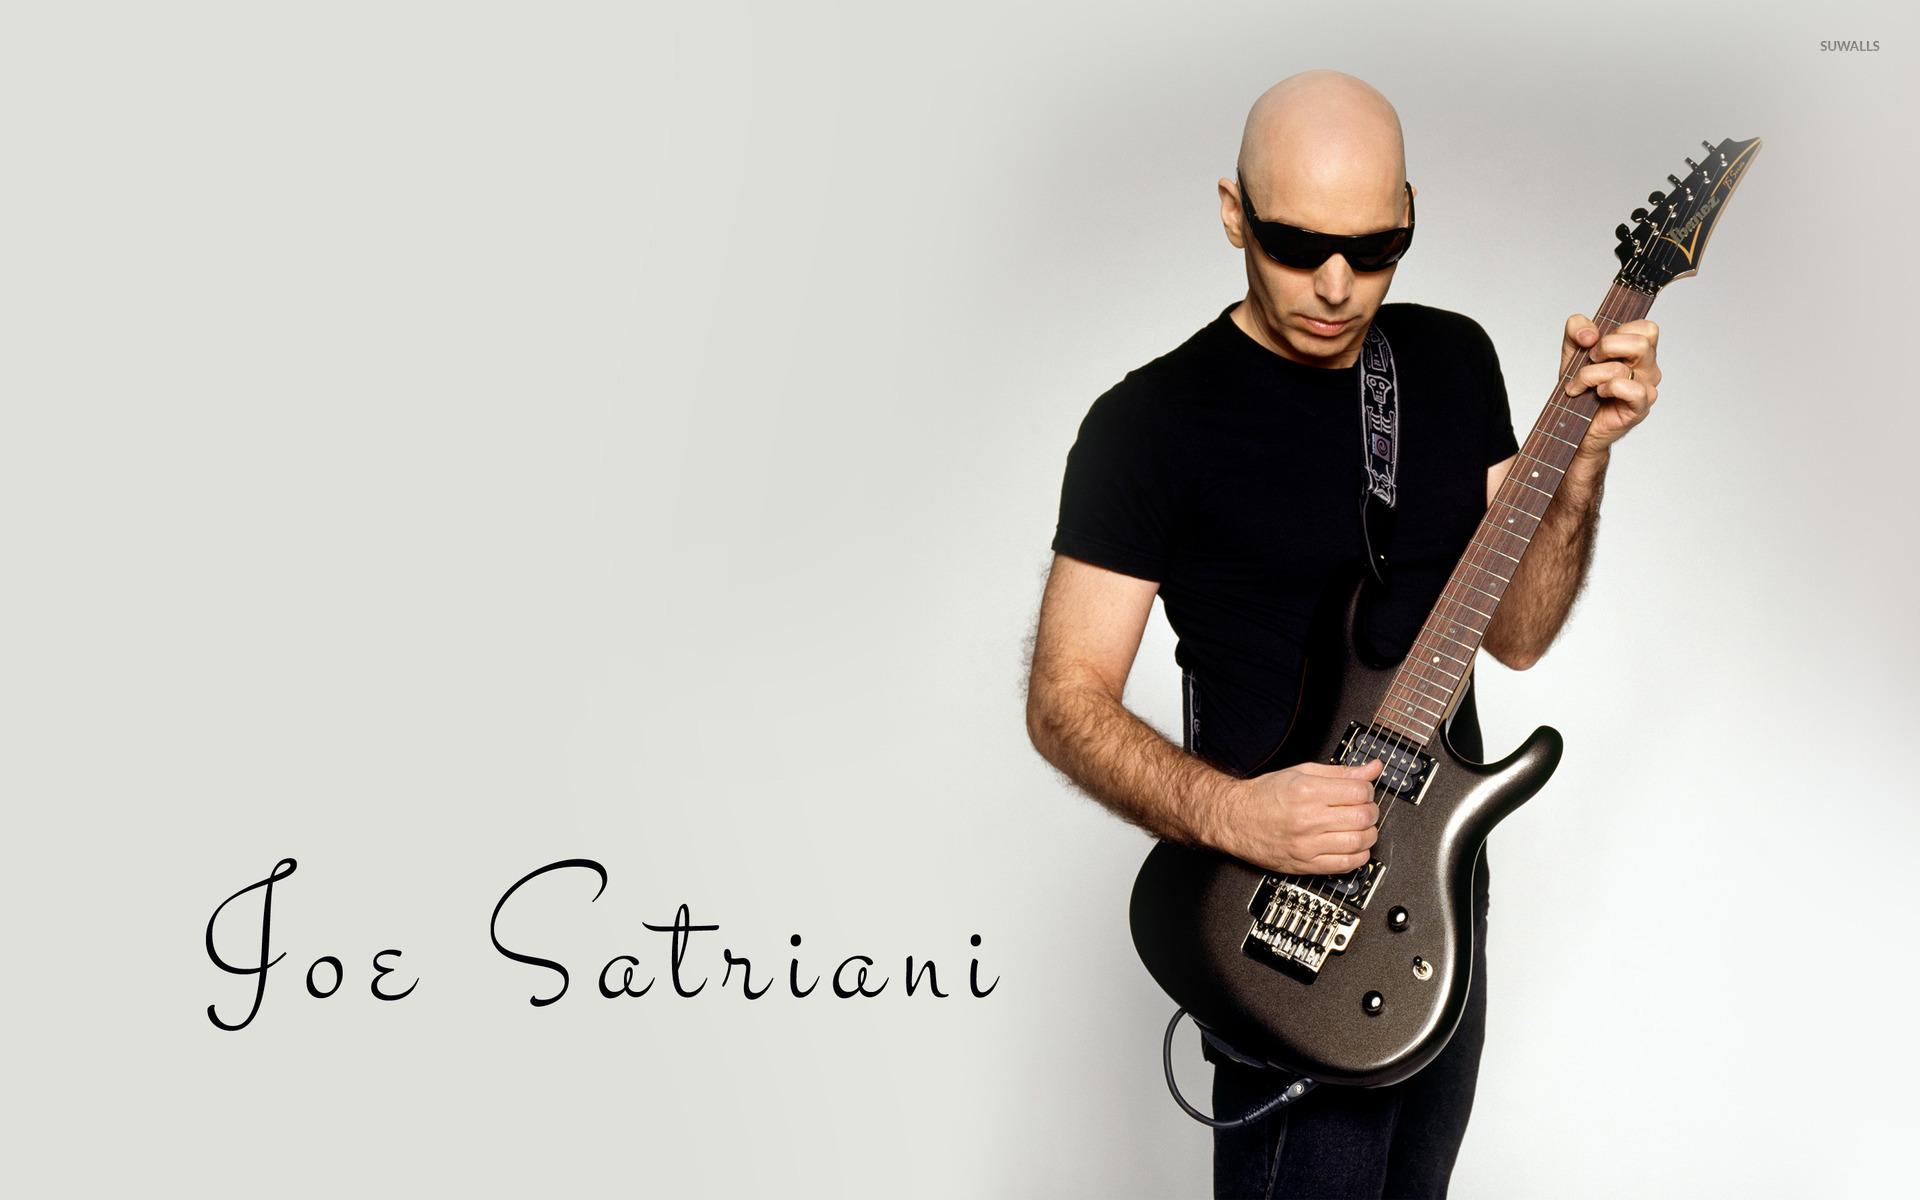 Joe Satriani wallpaper   Music wallpapers   20987 1920x1200